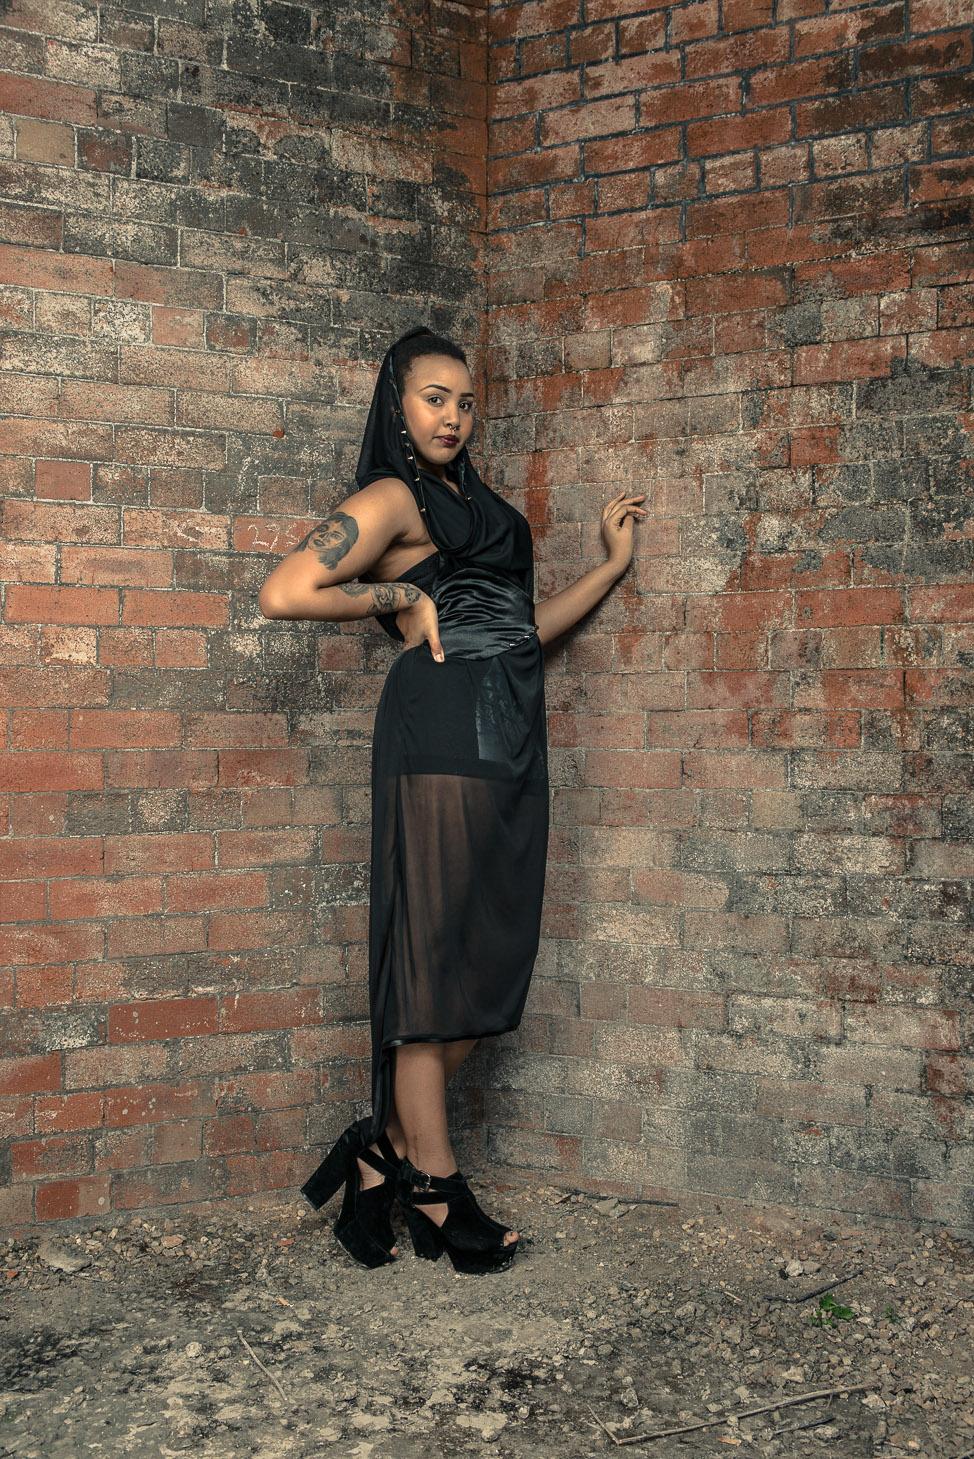 zaramia-ava-zaramiaava-leeds-fashion-designer-ethical-sustainable-tailored-minimalist-sheer-versatile-drape-dress-black-hood-binding-belt-wrap-cowl-styling-bodysuit-womenswear-models-photoshoot-7